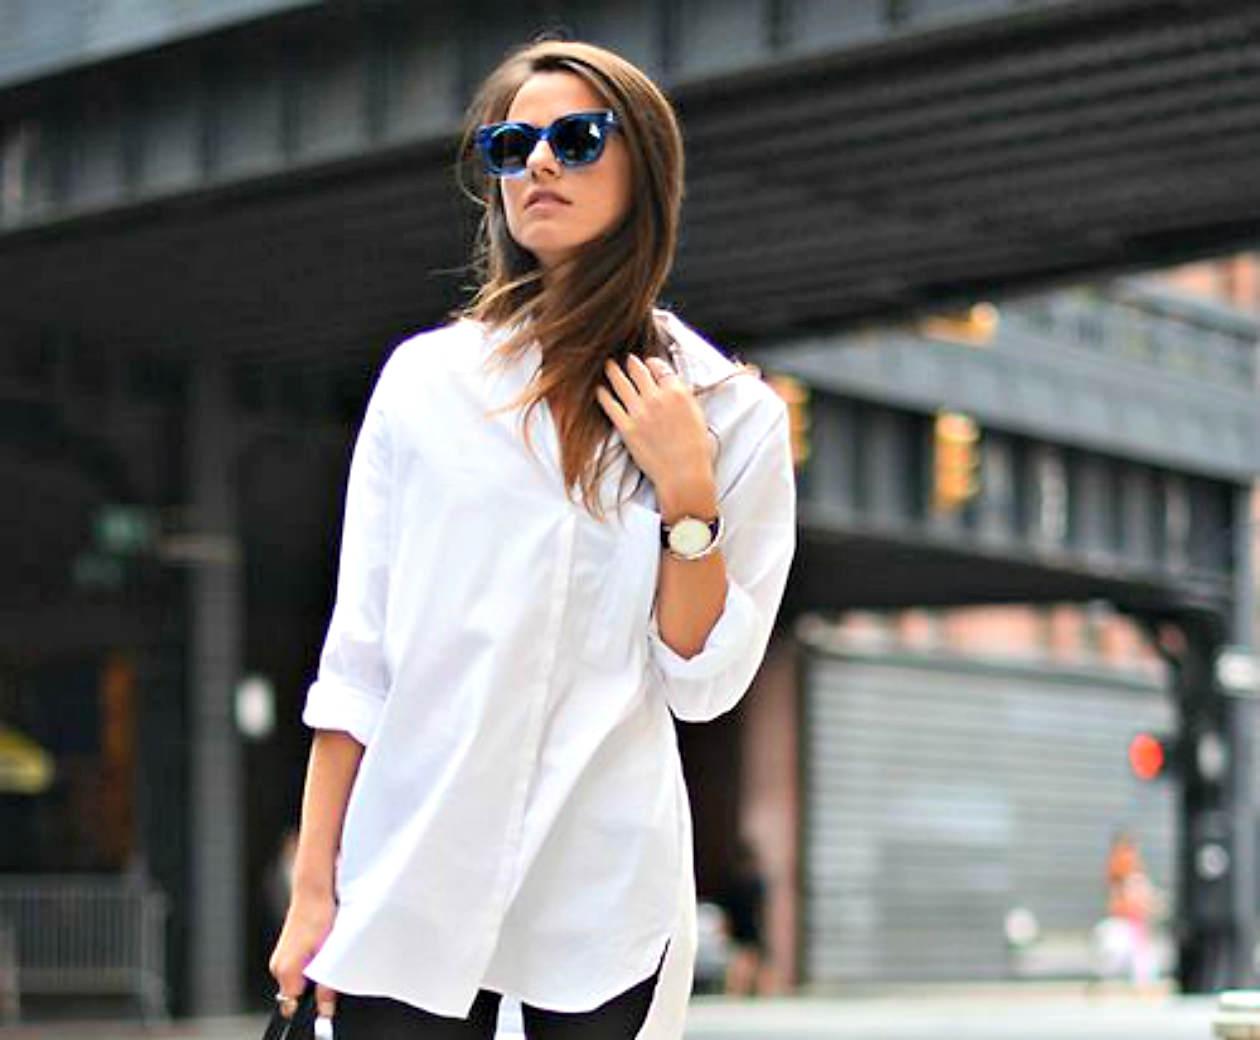 92dba660deec Φόρα με στιλ το λευκό σου πουκάμισο